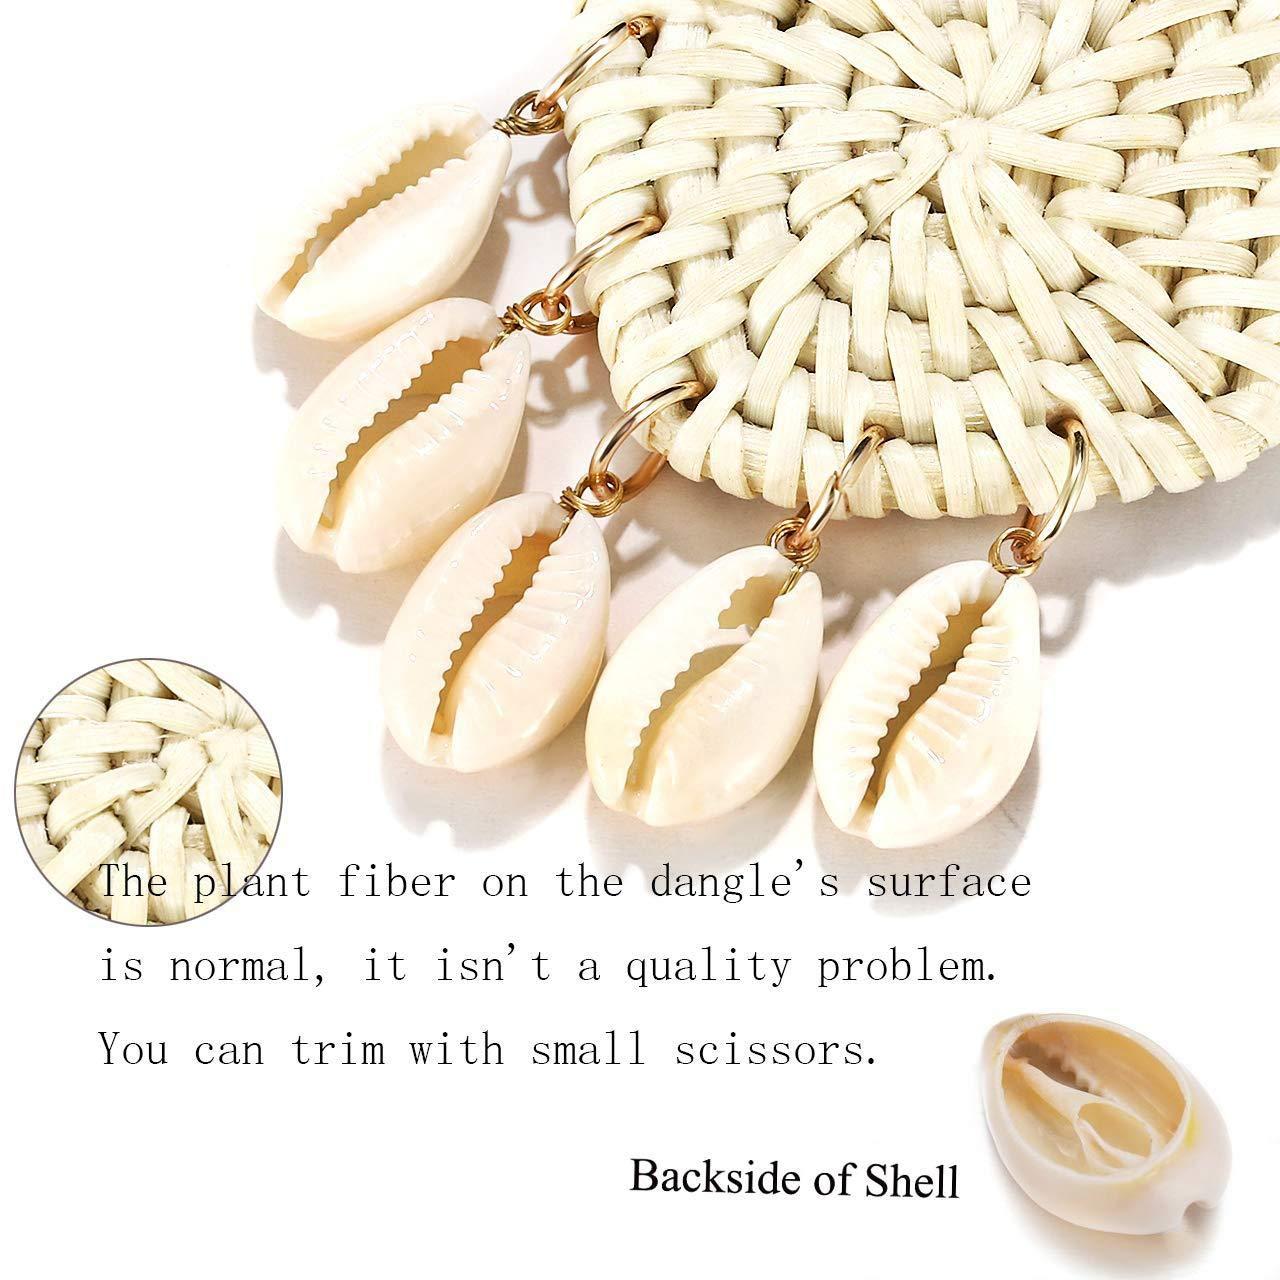 Mountainer Woven Rattan Shell Earrings Bohemian Handmade Lightweight Geometirc Statement Dangle Earrings for Women Girls Beach Jewelry